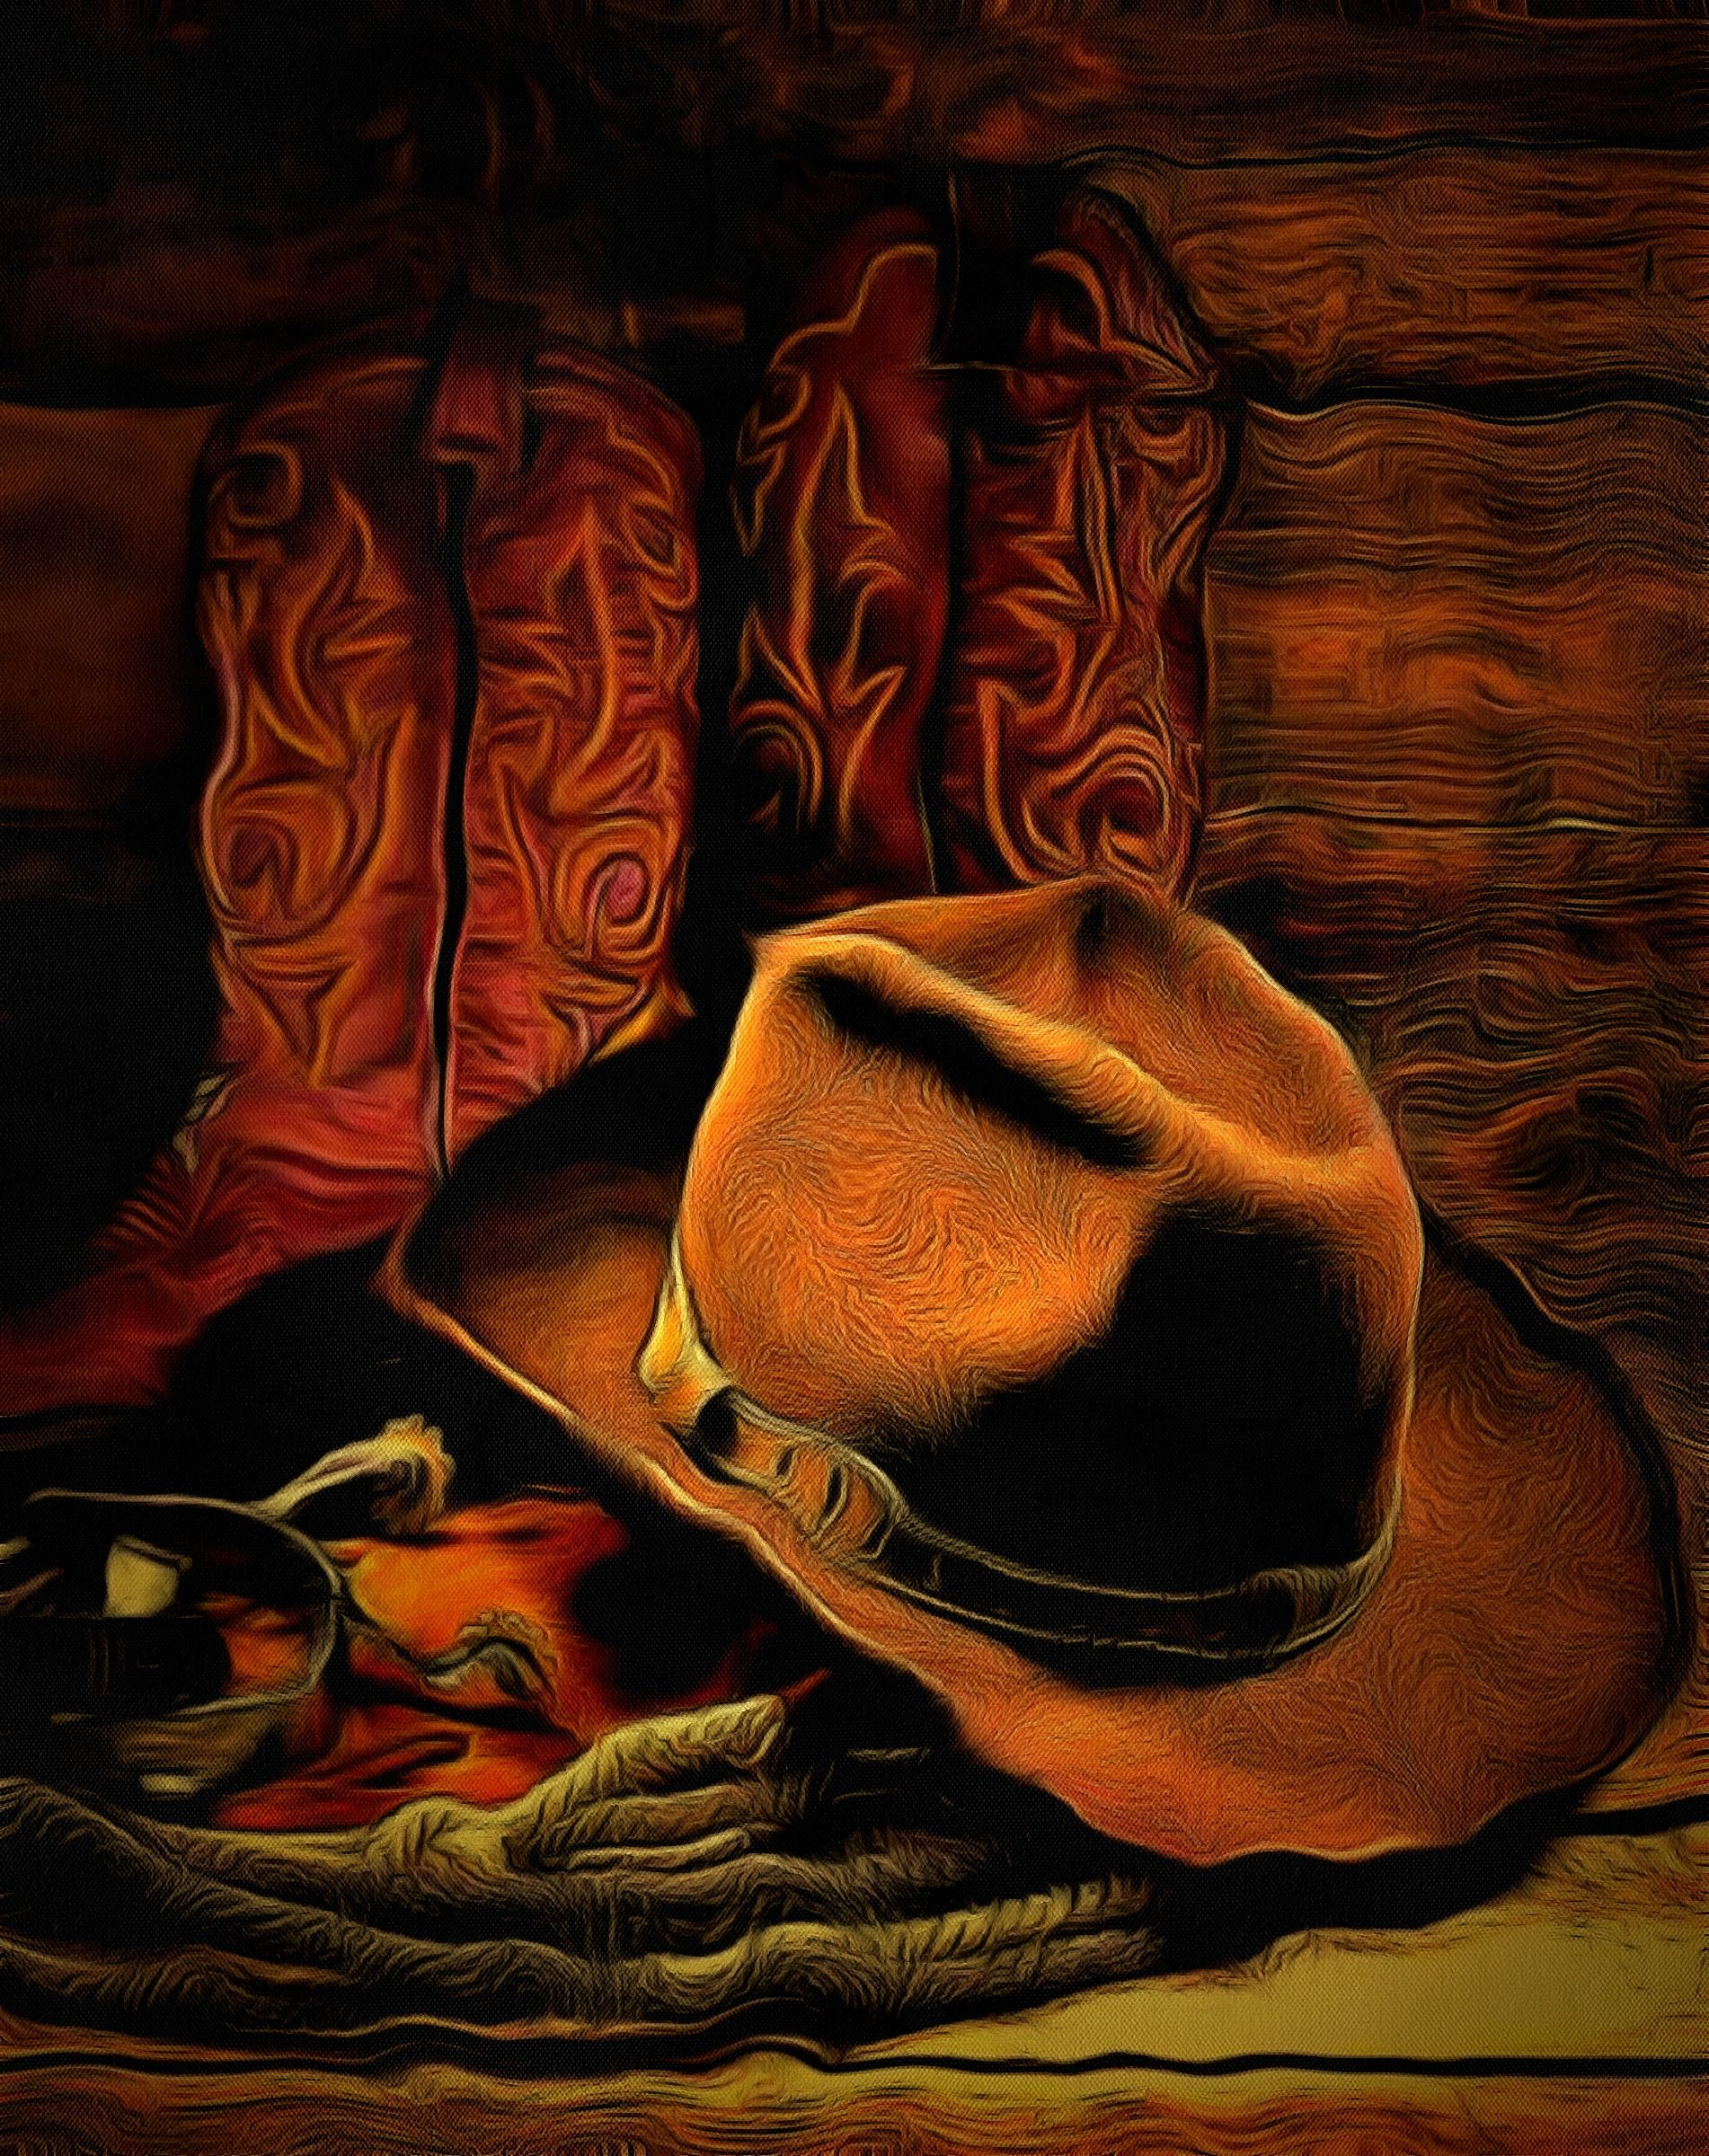 a0d7ce4cdf5 Cowboy Hat Still Life